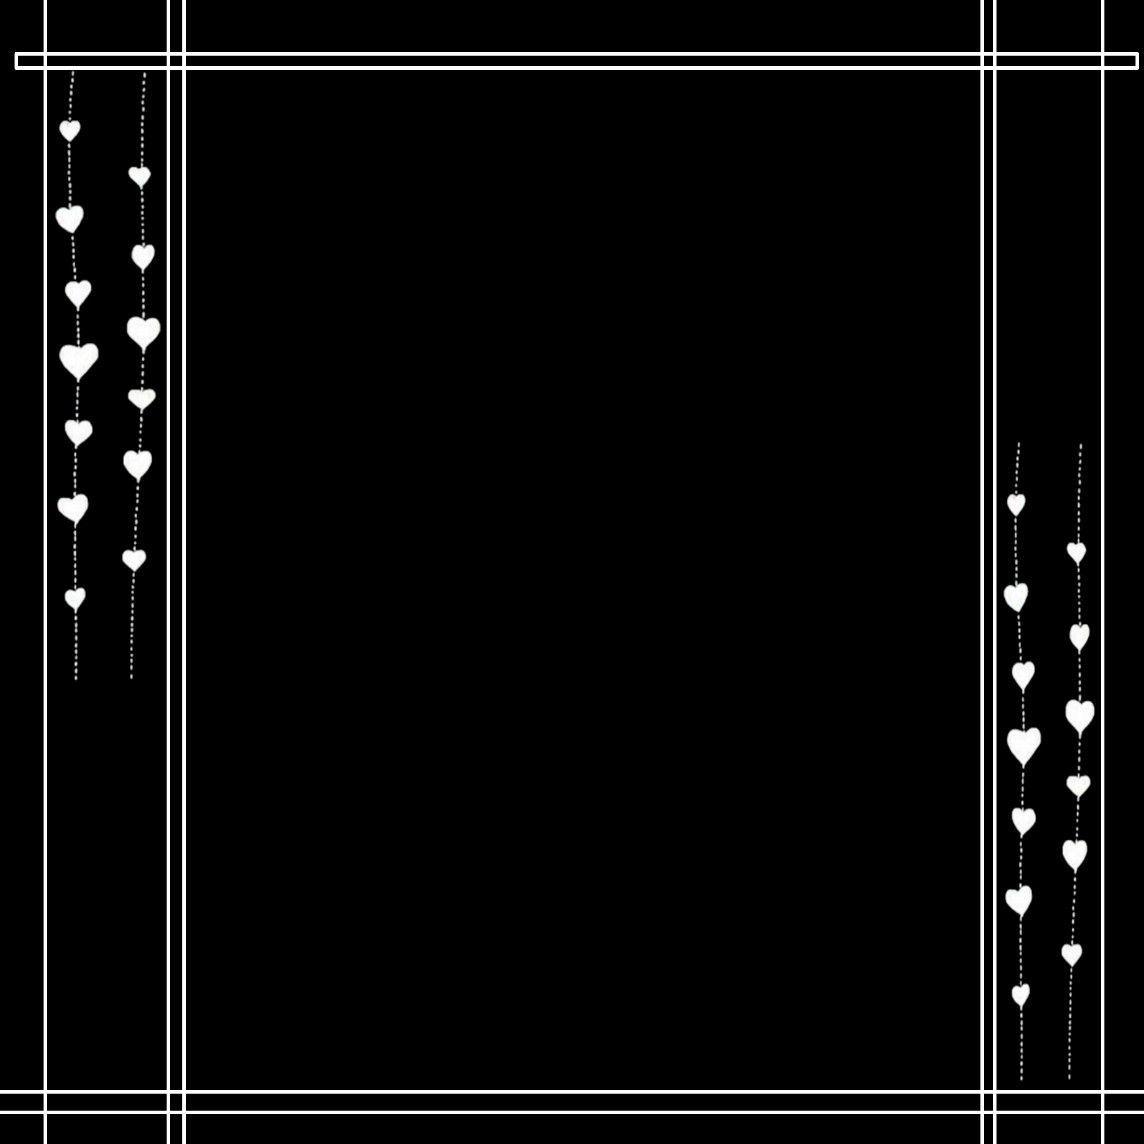 White Line Border Overlays Picsart Overlays Instagram Picsart Png